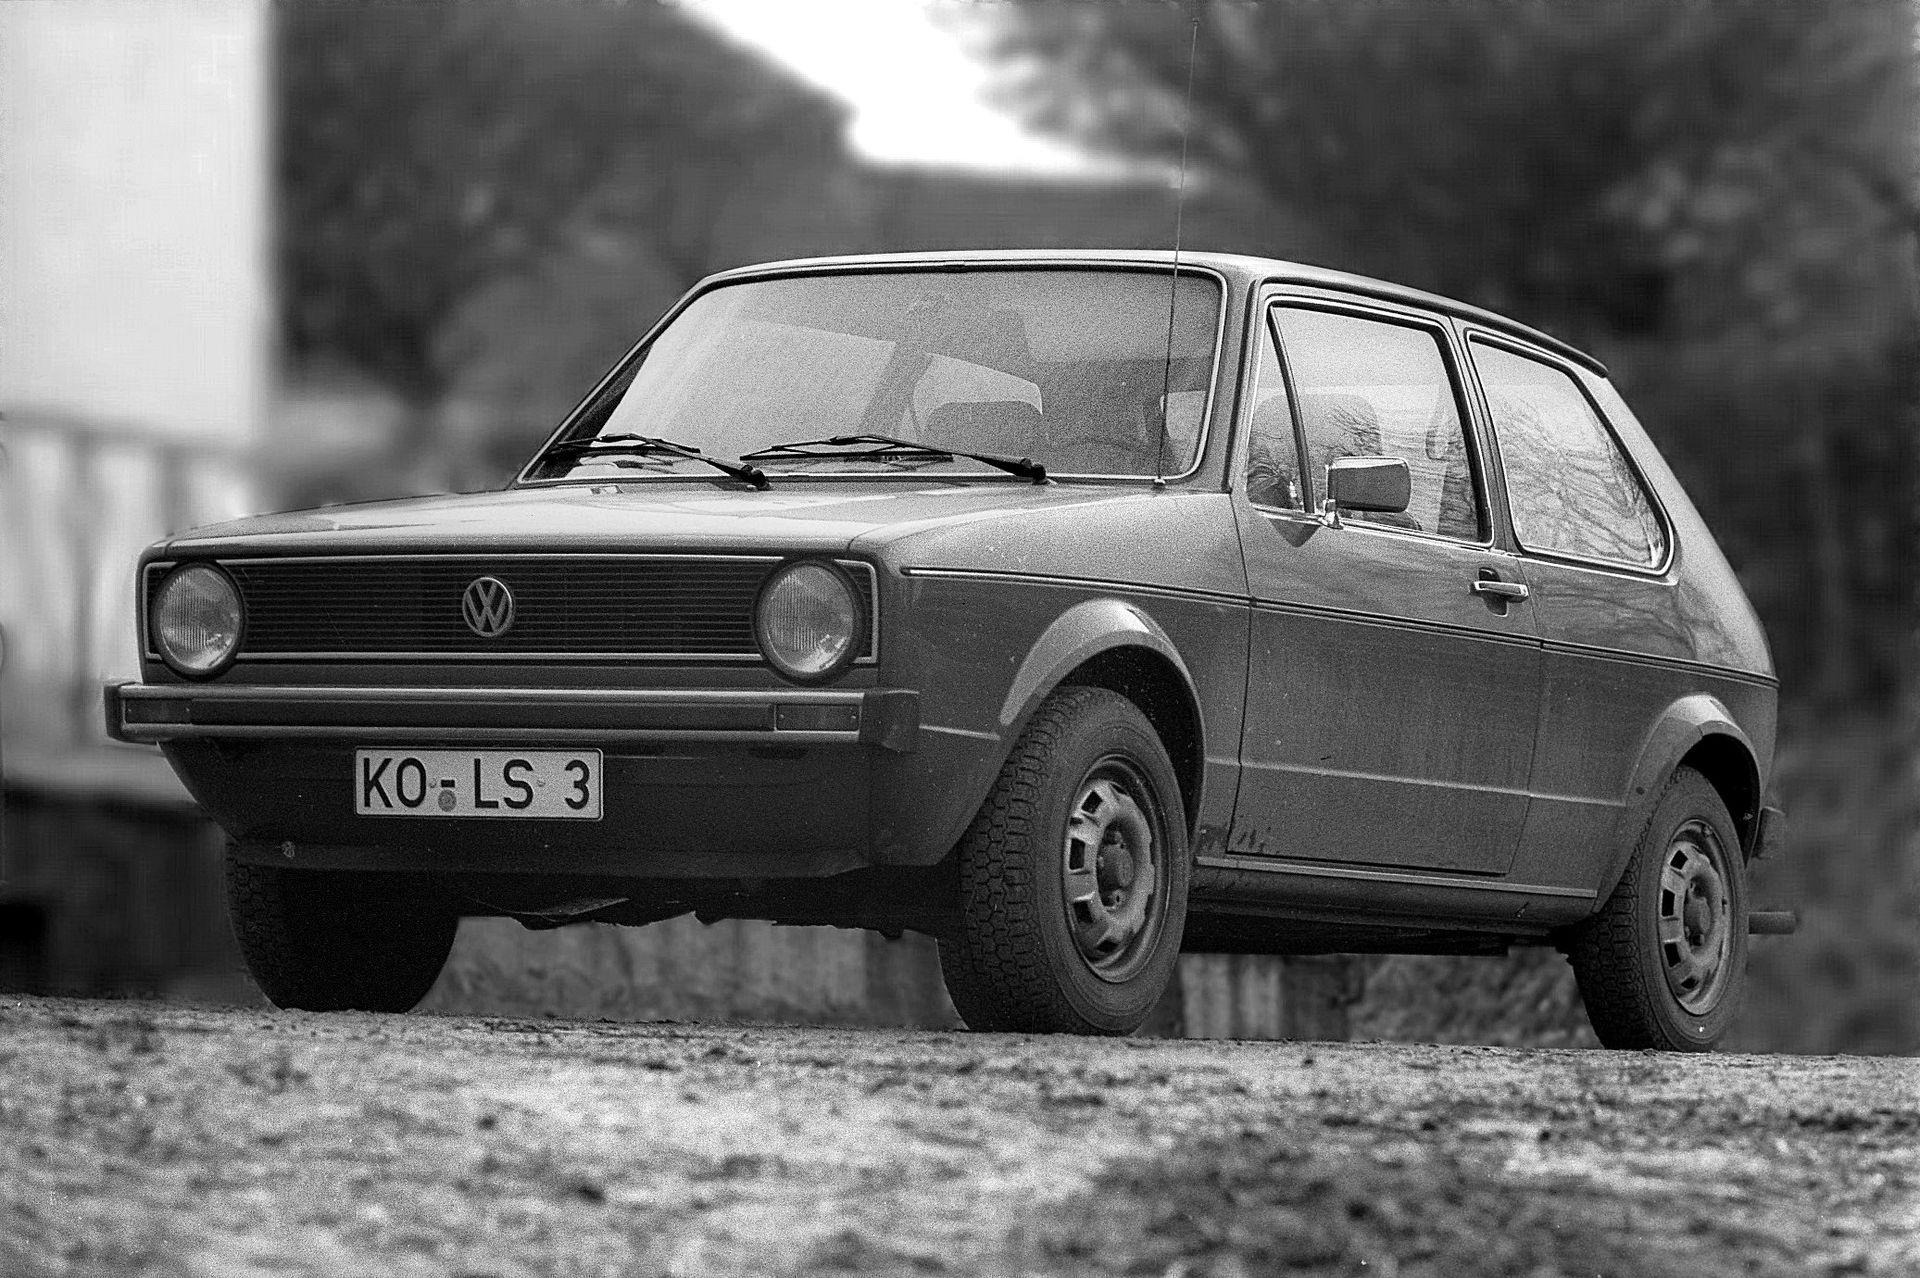 1920px-VW_Golf_1,_Bj._1974_(1975-02).jpg